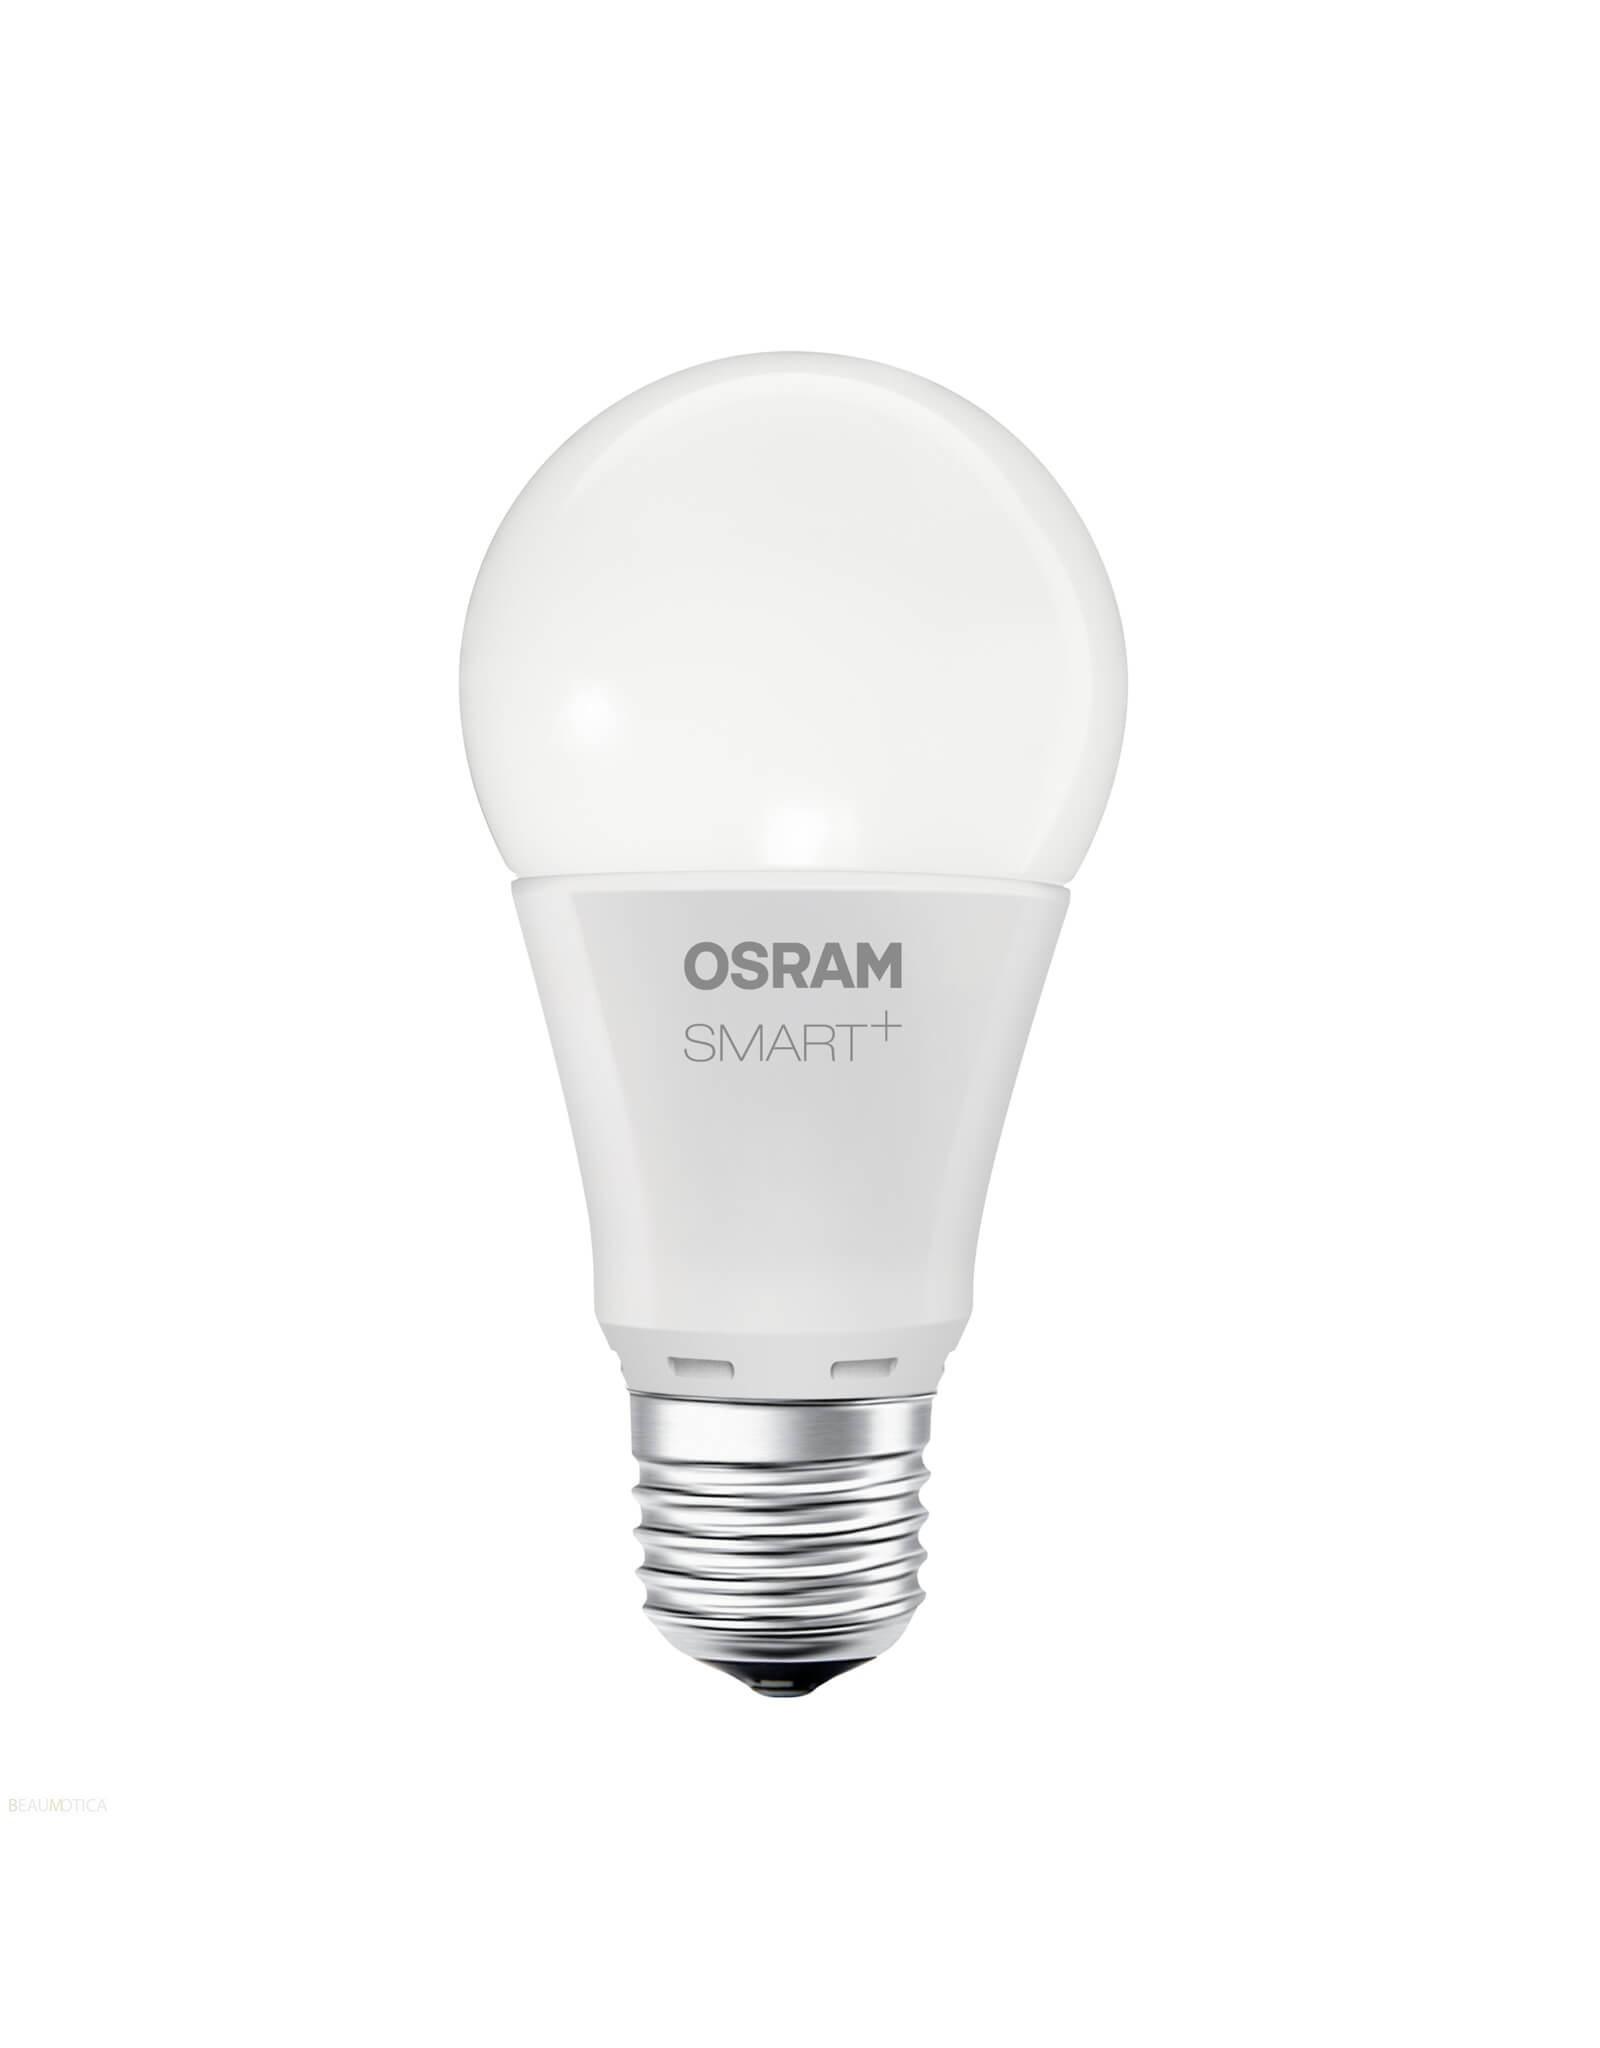 OSRAM  OSRAM Smart+ LED